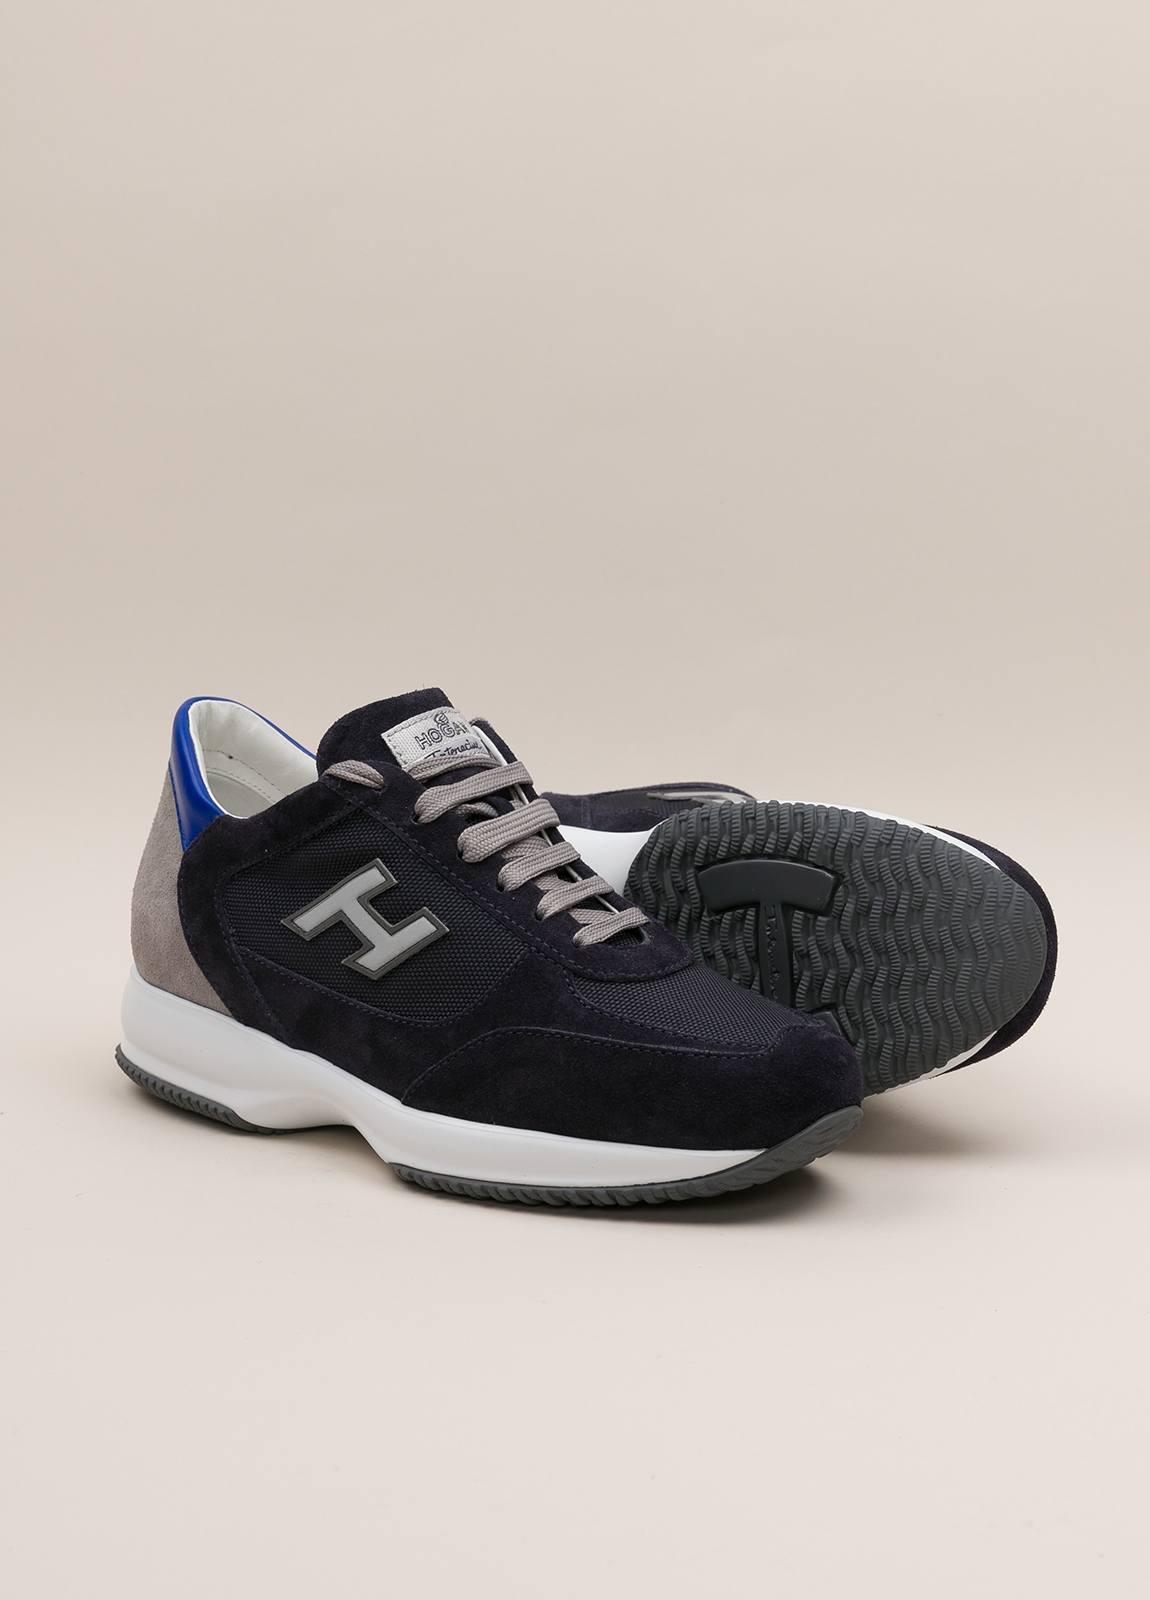 Calzado sport HOGAN marino - Ítem1